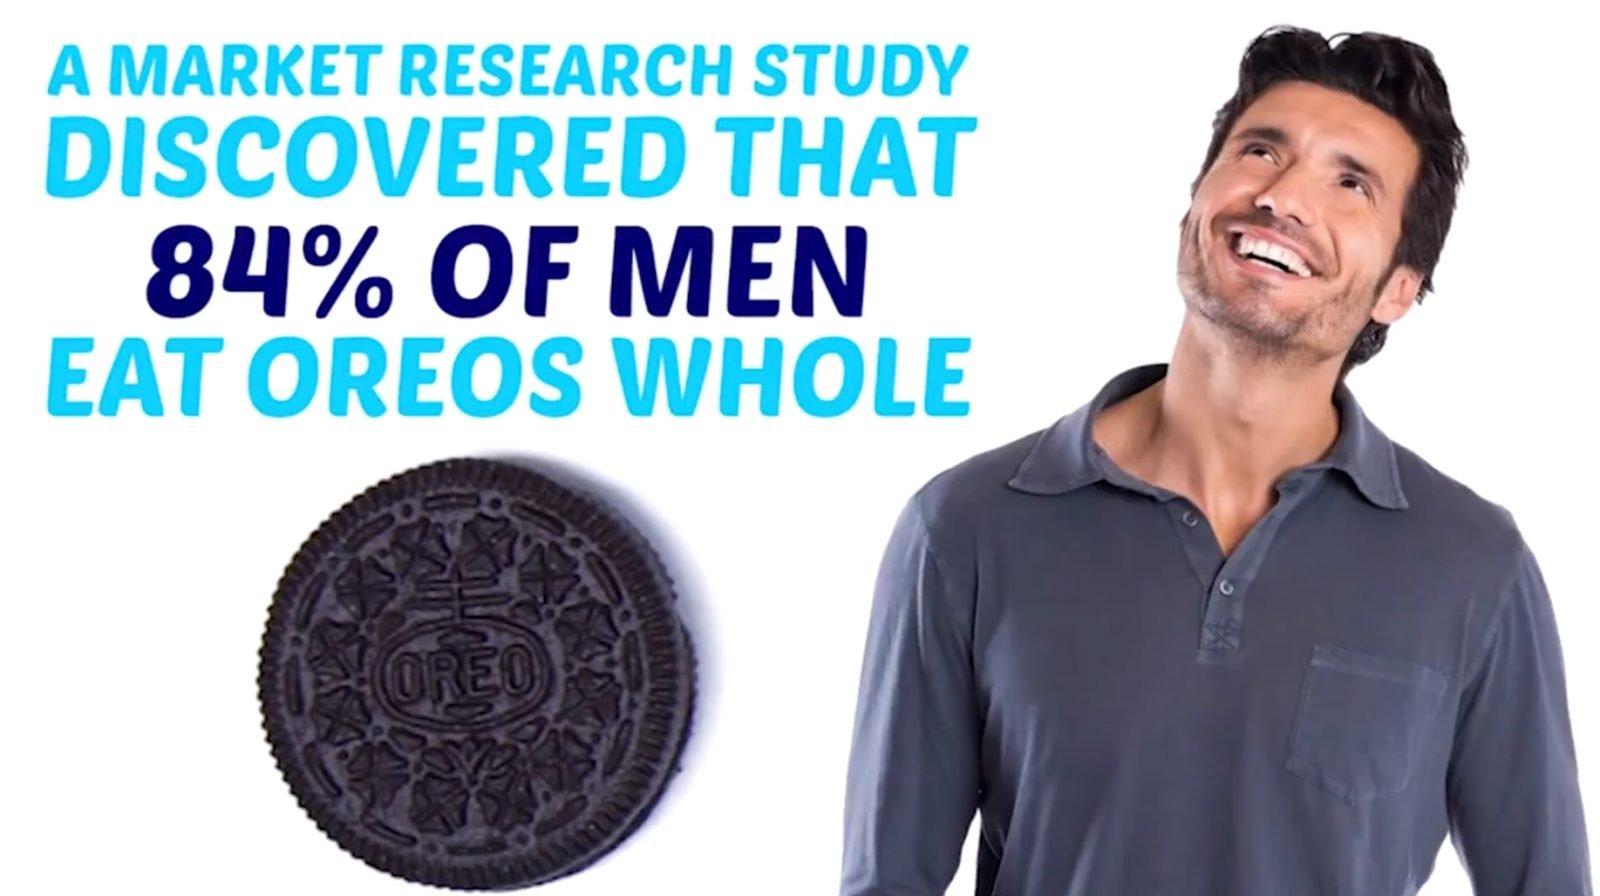 Eat Oreo Closed